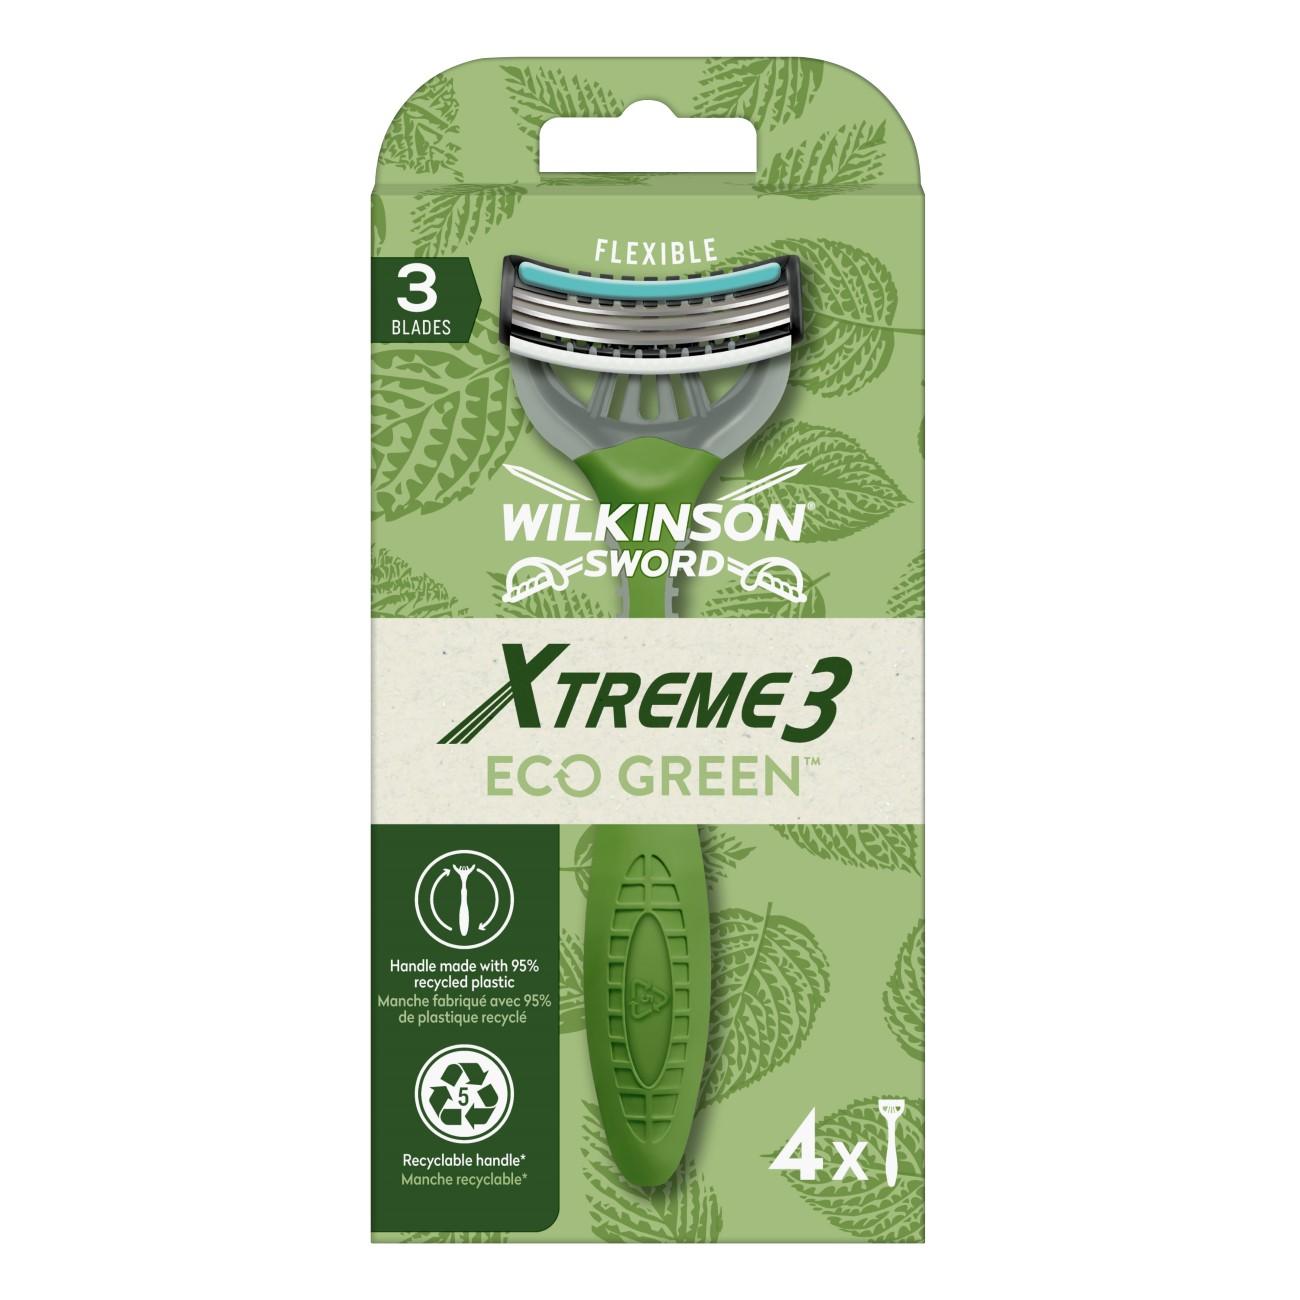 Wilkinson Sword Xtreme 3 Eco Green